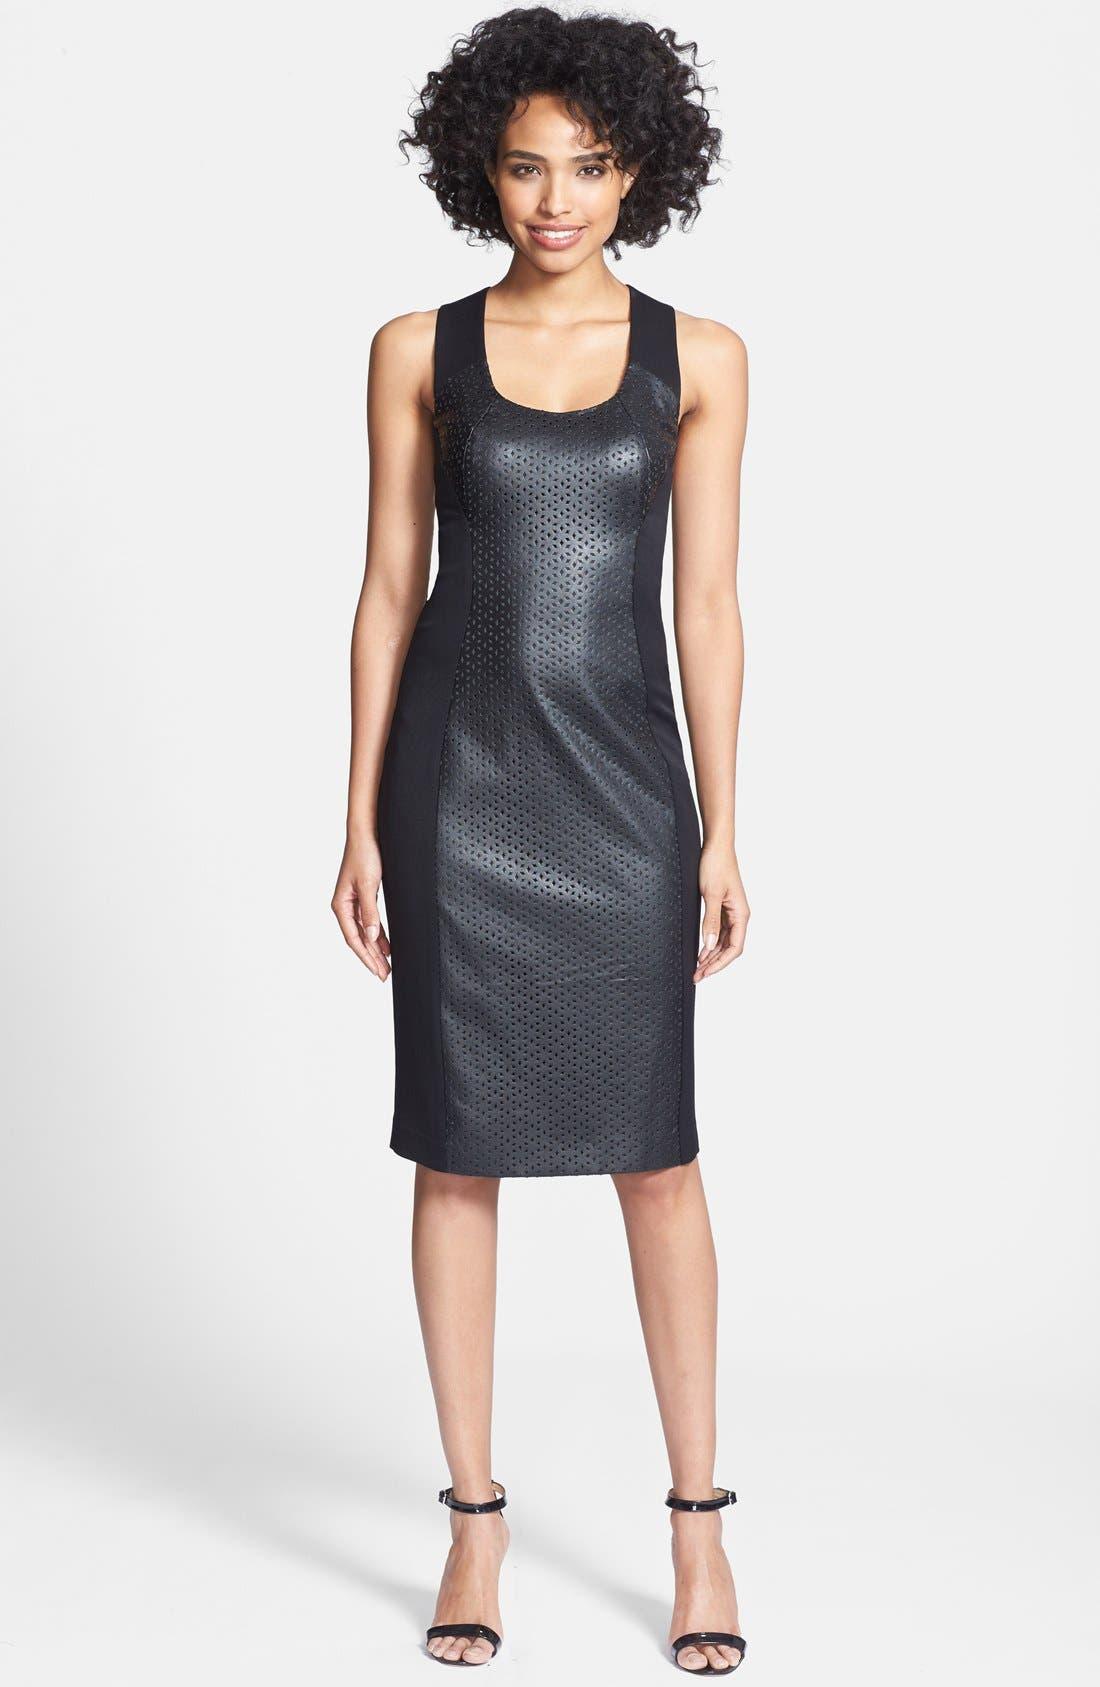 Alternate Image 1 Selected - Black Halo 'Blayze' Laser Cut Faux Leather & Gabardine Dress